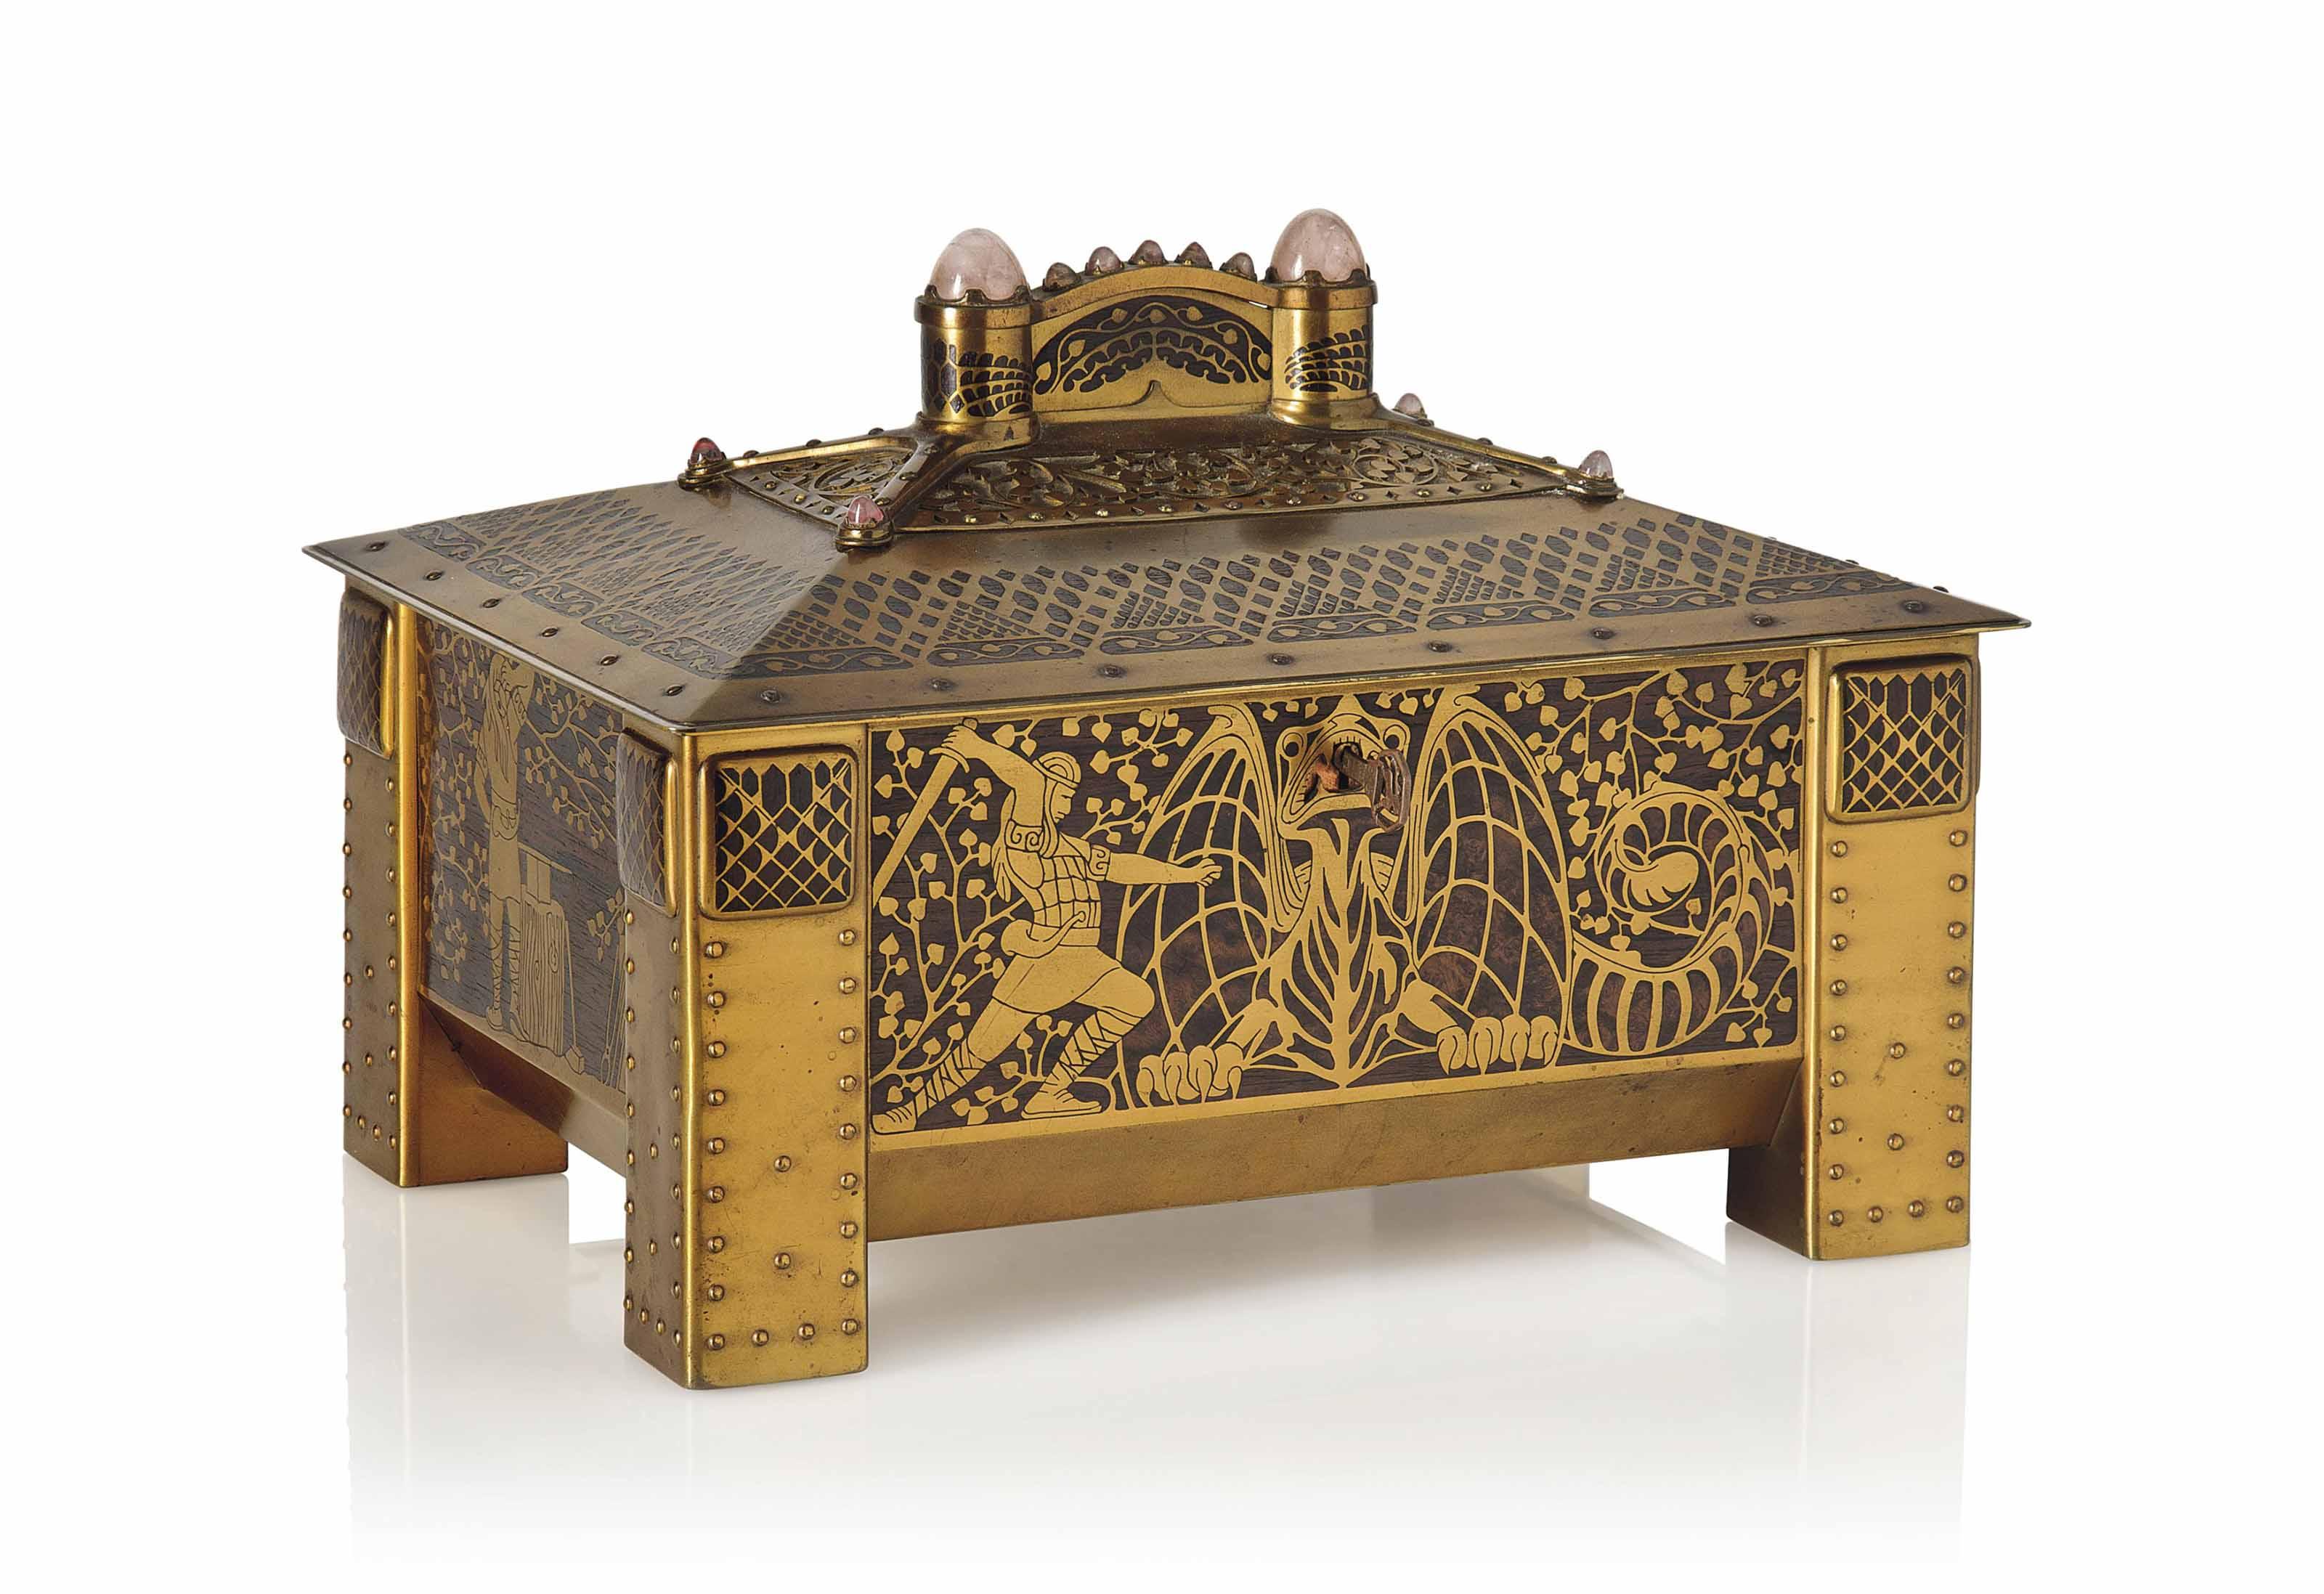 2014_CSK_05251_0069_000(an_erhard_sohne_amboyna_and_brass_casket_circa_1920)